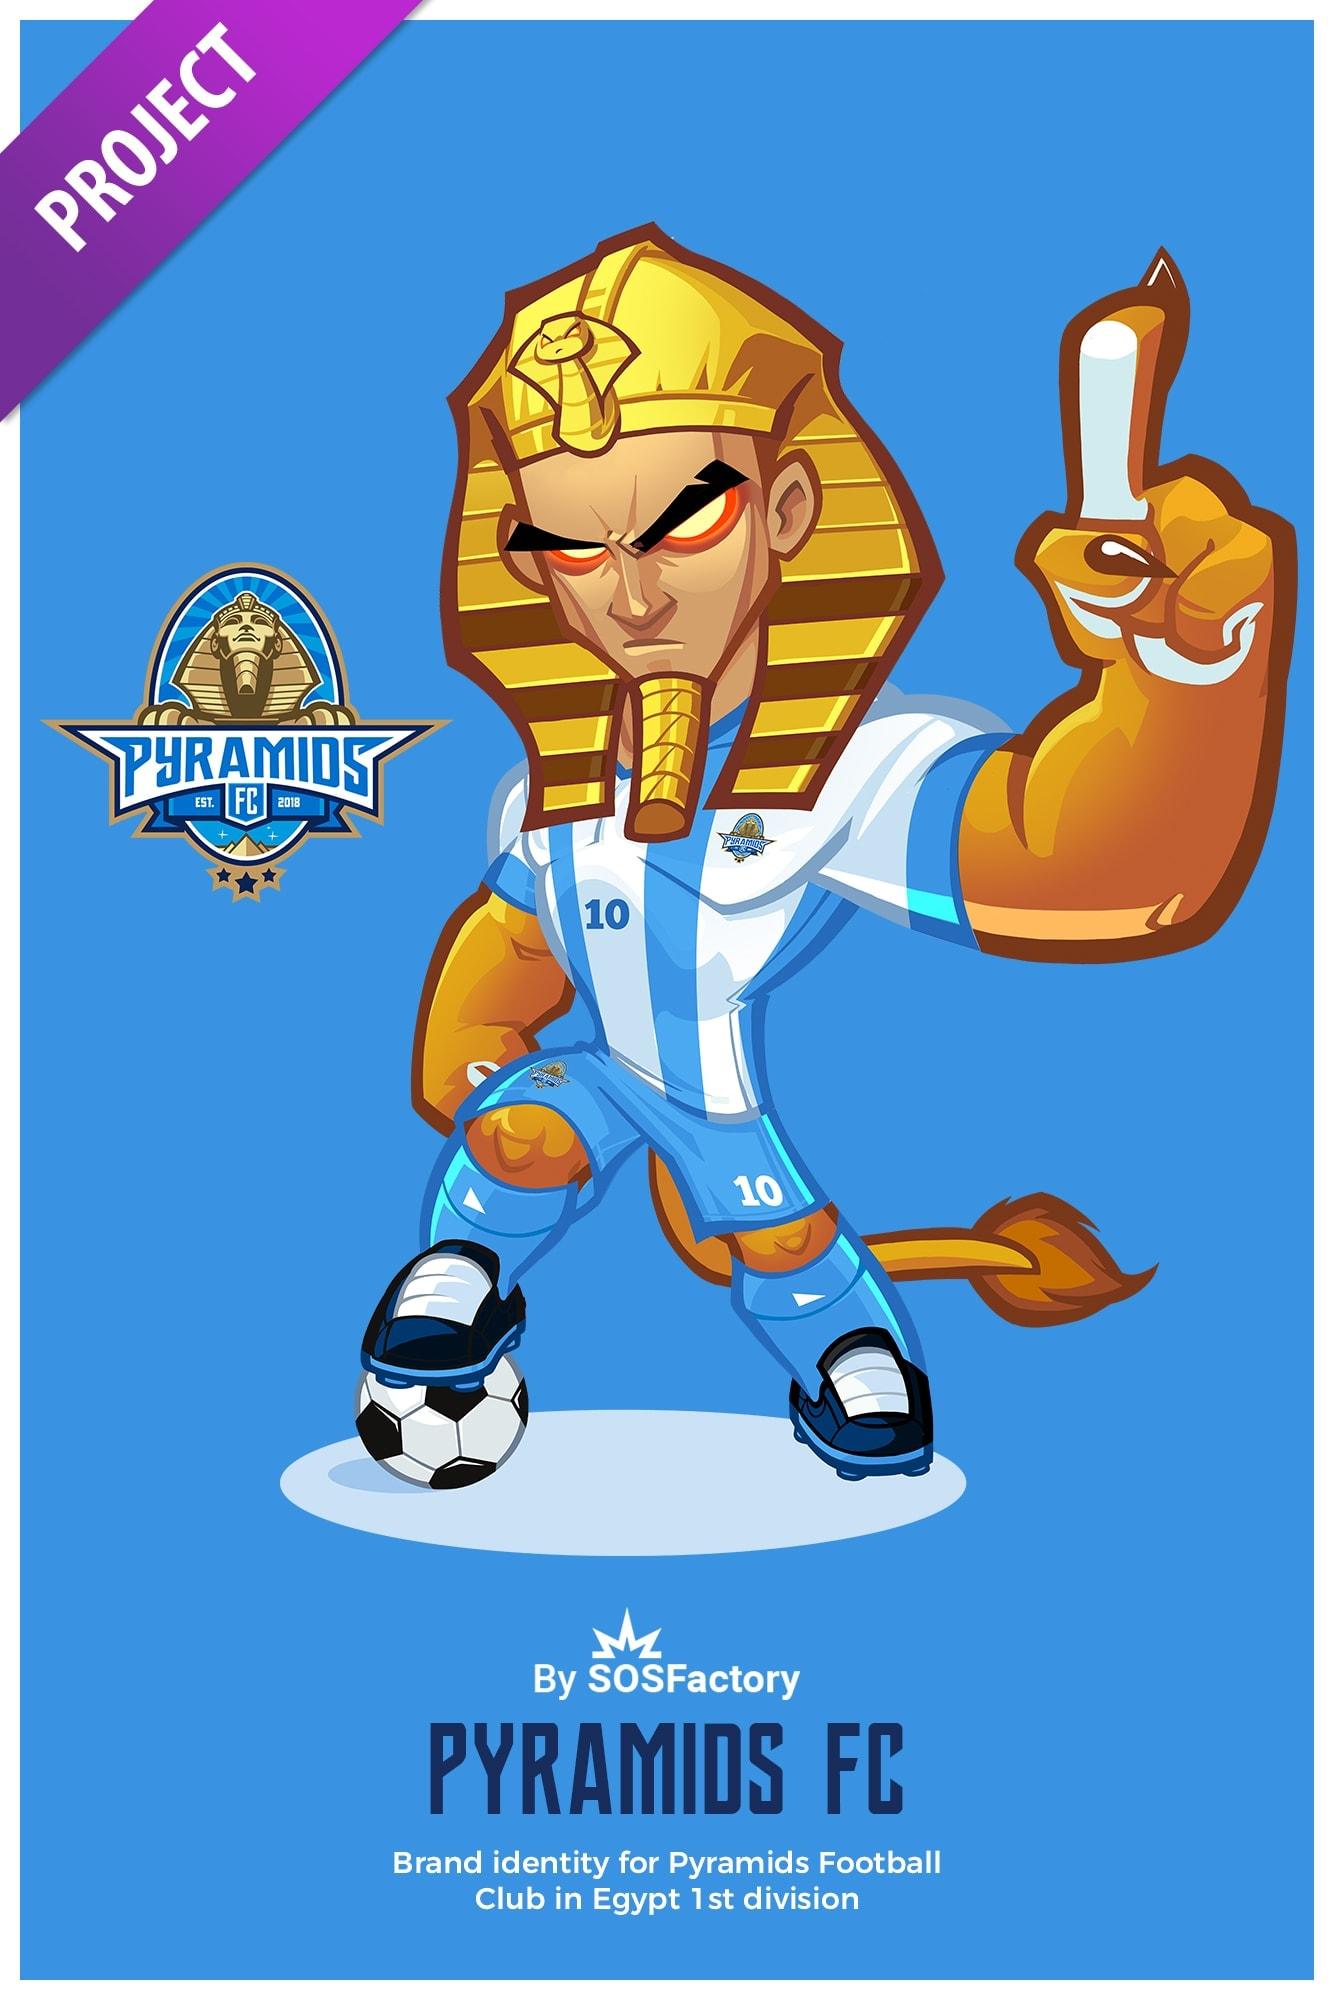 mascot and logo for pyramids